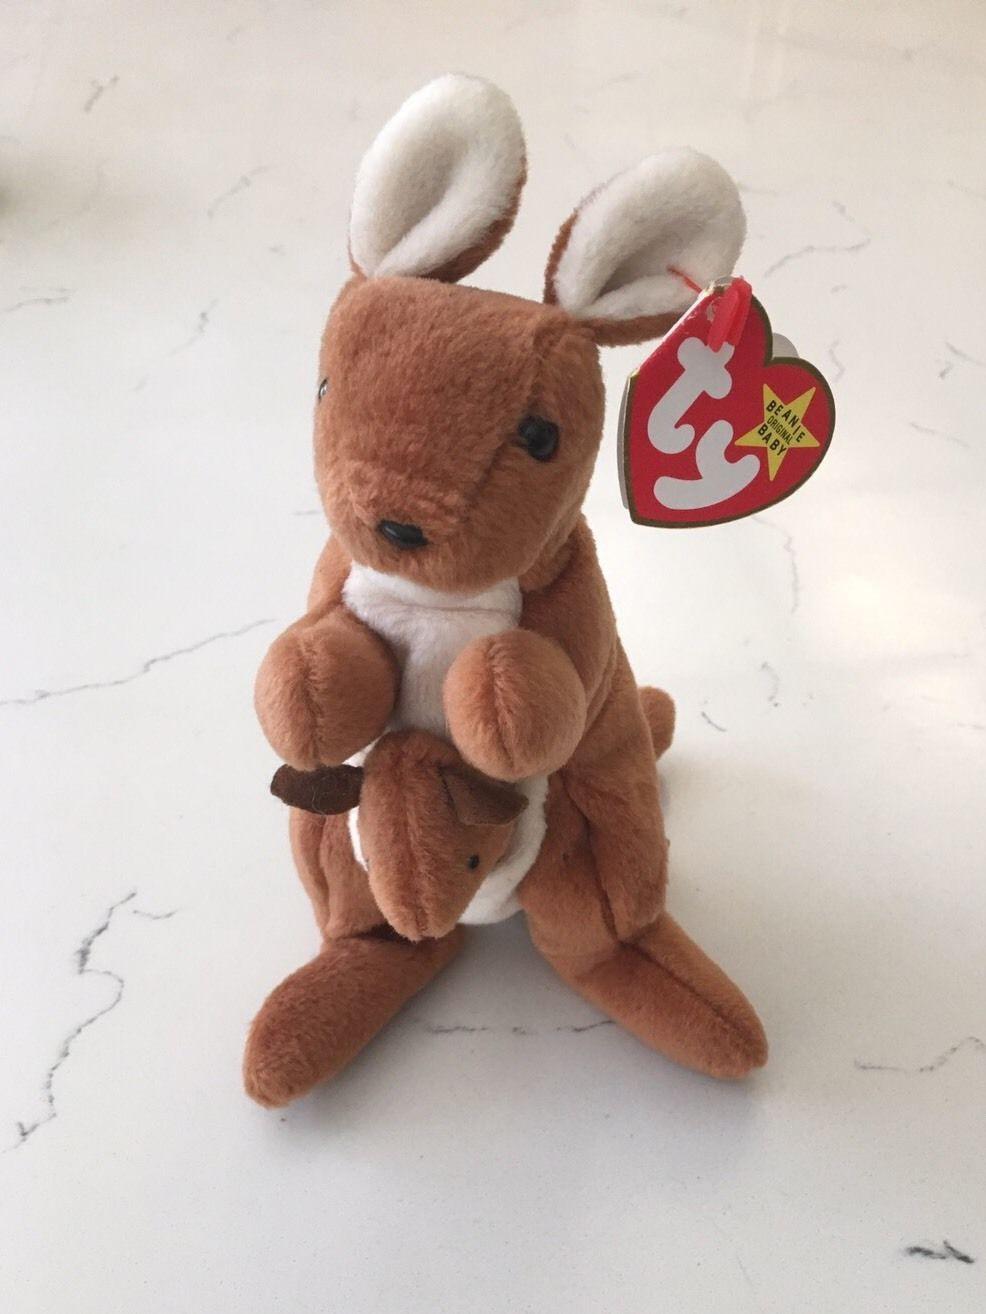 5fe6e05c55e RARE Ty Beanie Baby Pouch the Kangaroo With Errors PVC Pellets ...